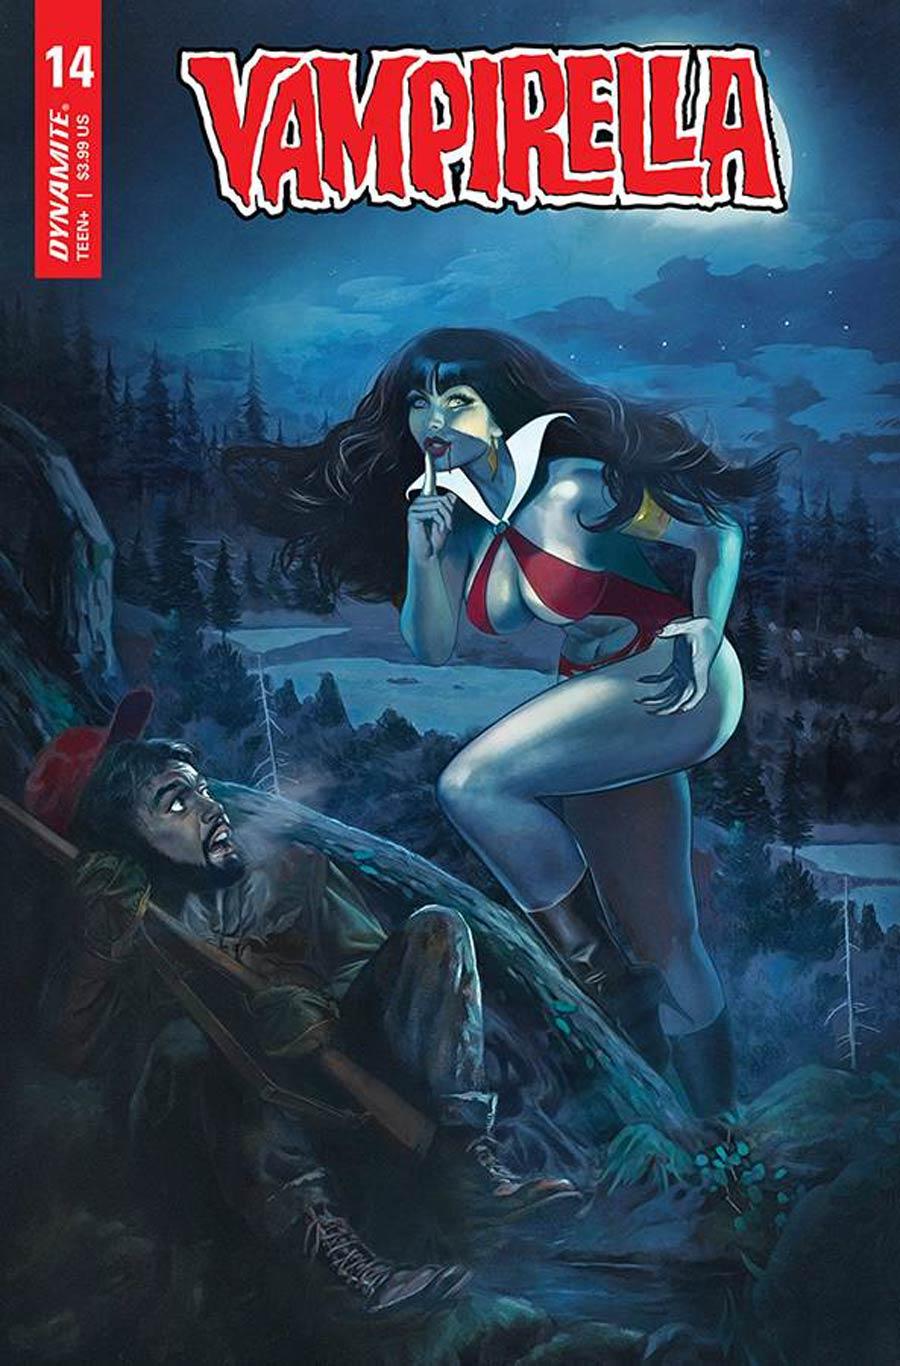 Vampirella Vol 8 #14 Cover C Variant Fay Dalton Cover